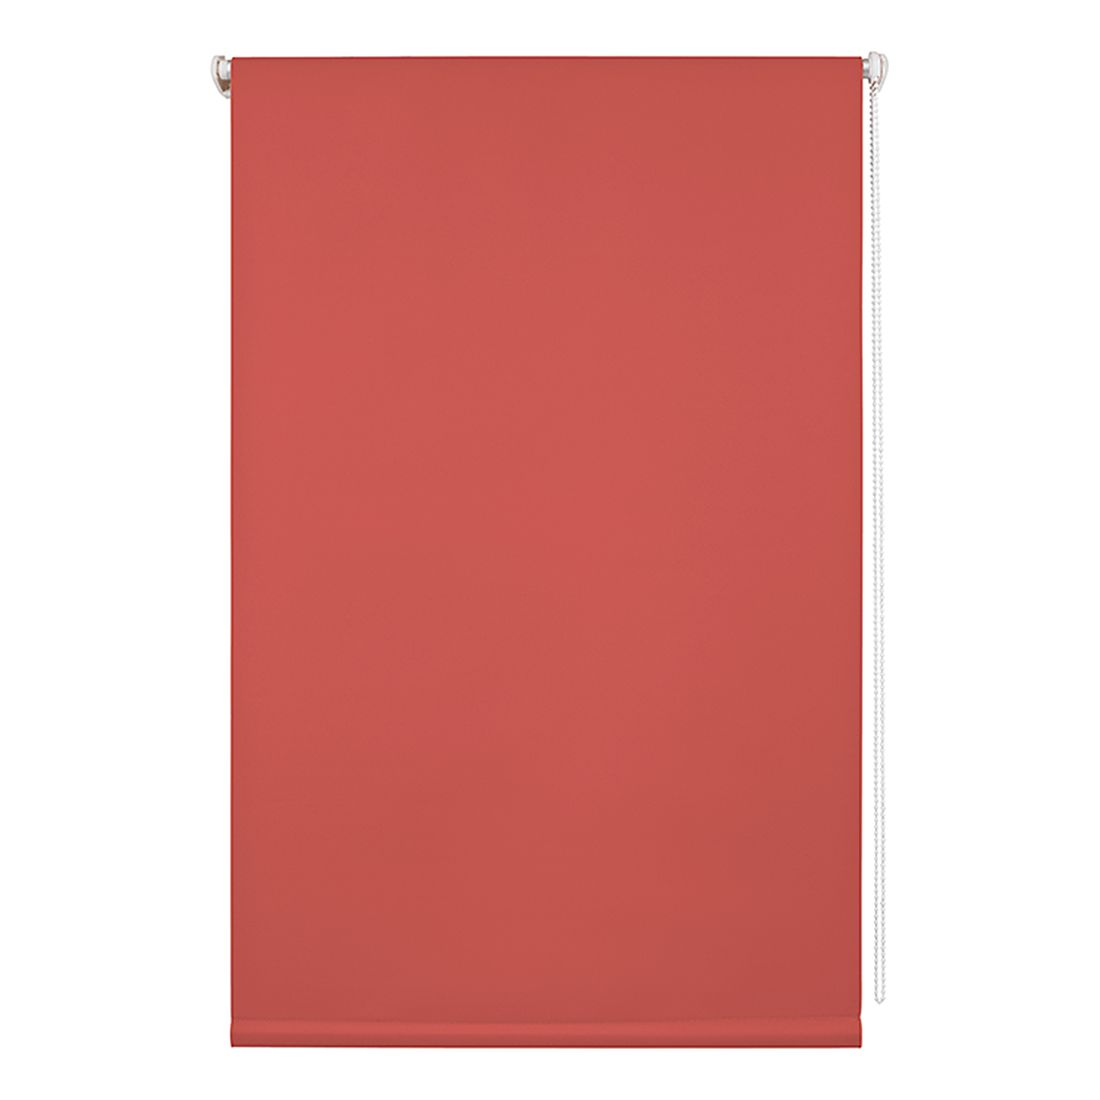 Rollo Klemmfix, Thermo/Verdunkelung – Polyester, Terracotta – Abmessungen (H x B): 150 x 100 cm, Wohn-Guide kaufen